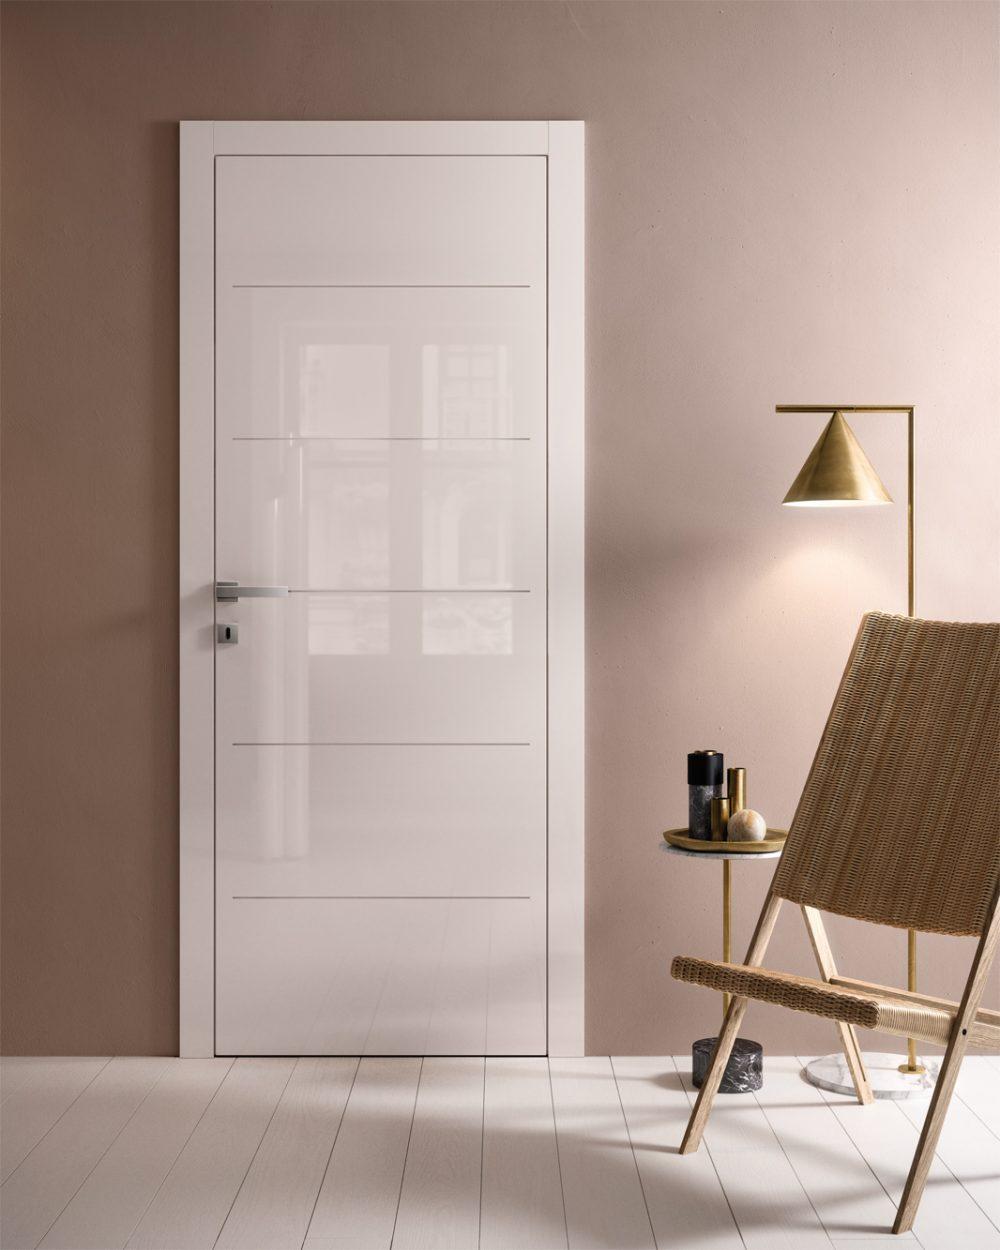 Porta laccata lucida bianca Luxpoema - Gidea